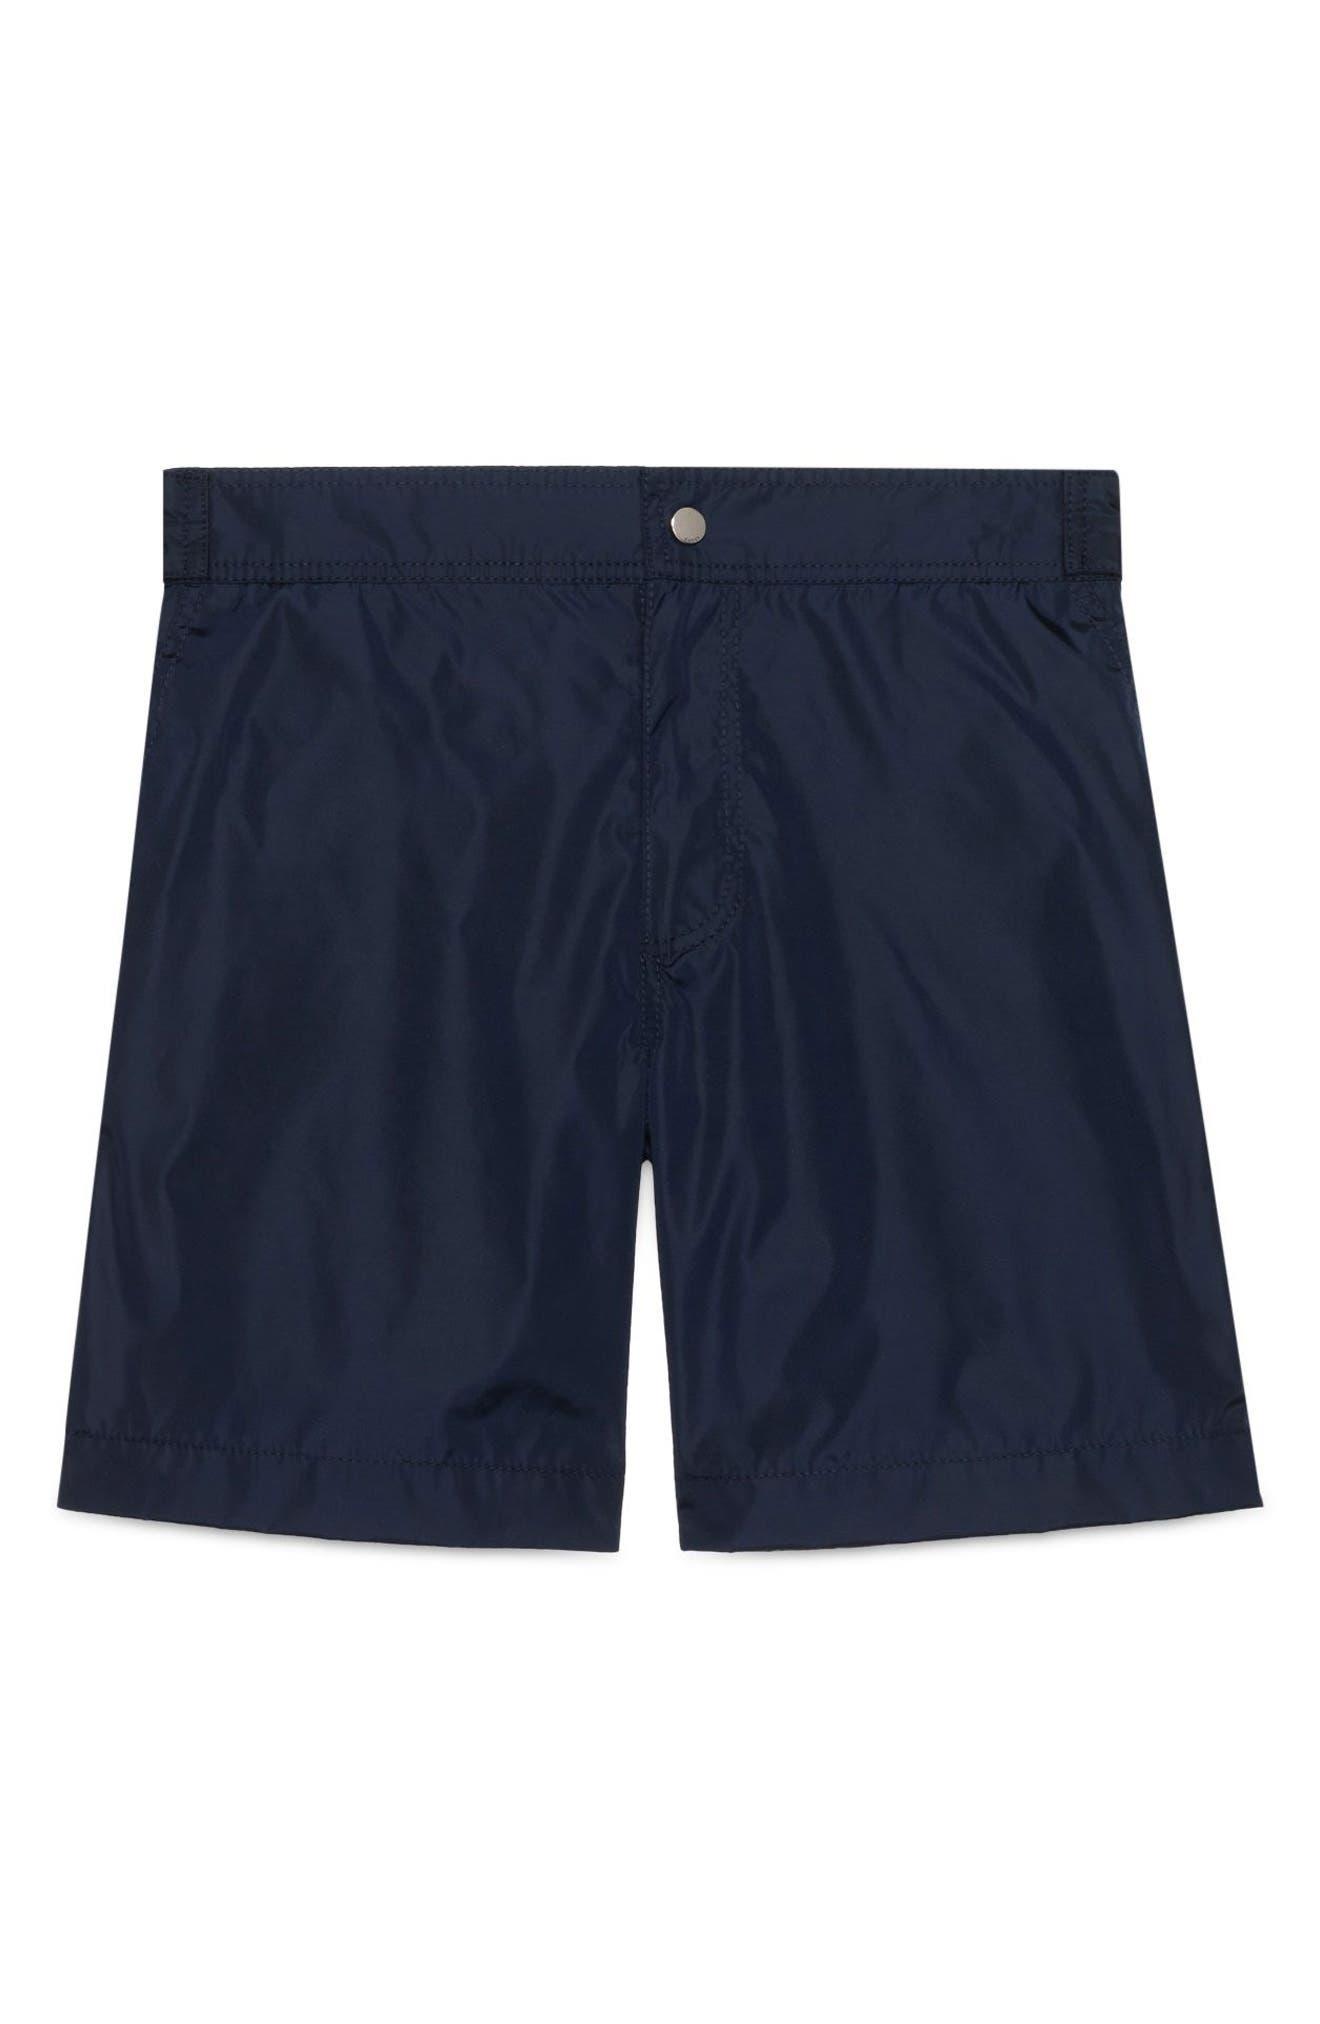 Swim Trunks,                         Main,                         color, 404